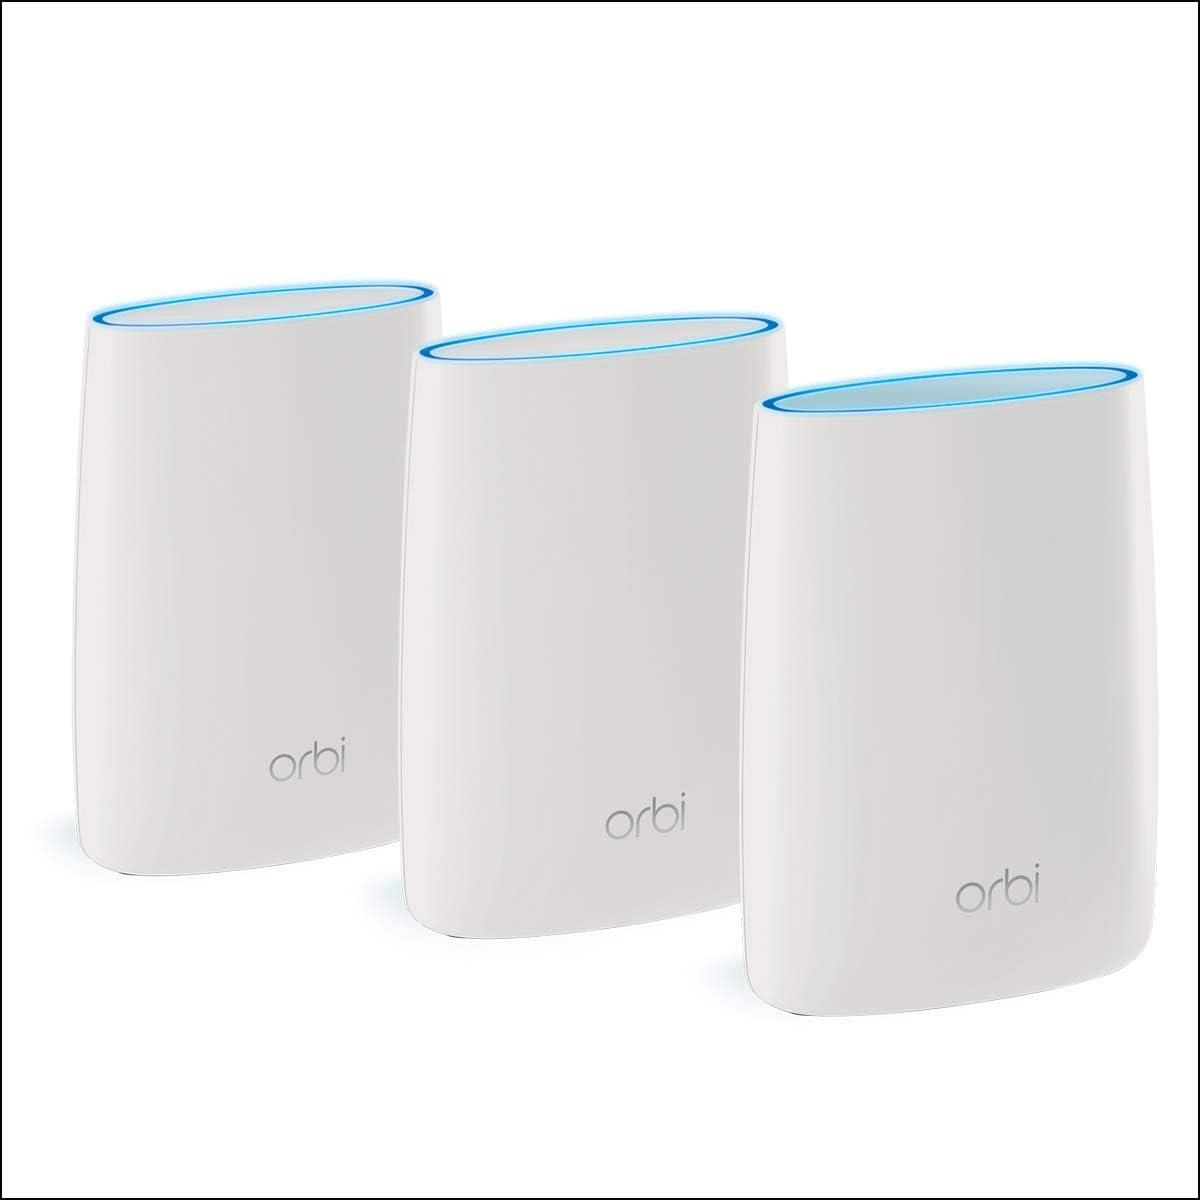 Netgear Orbi RBK53 - Sistema WiFi Mesh tribanda AC3000, cobertura de hasta 525 m², kit de 3, con 1 router y 2 satélites: Netgear: Amazon.es: Informática